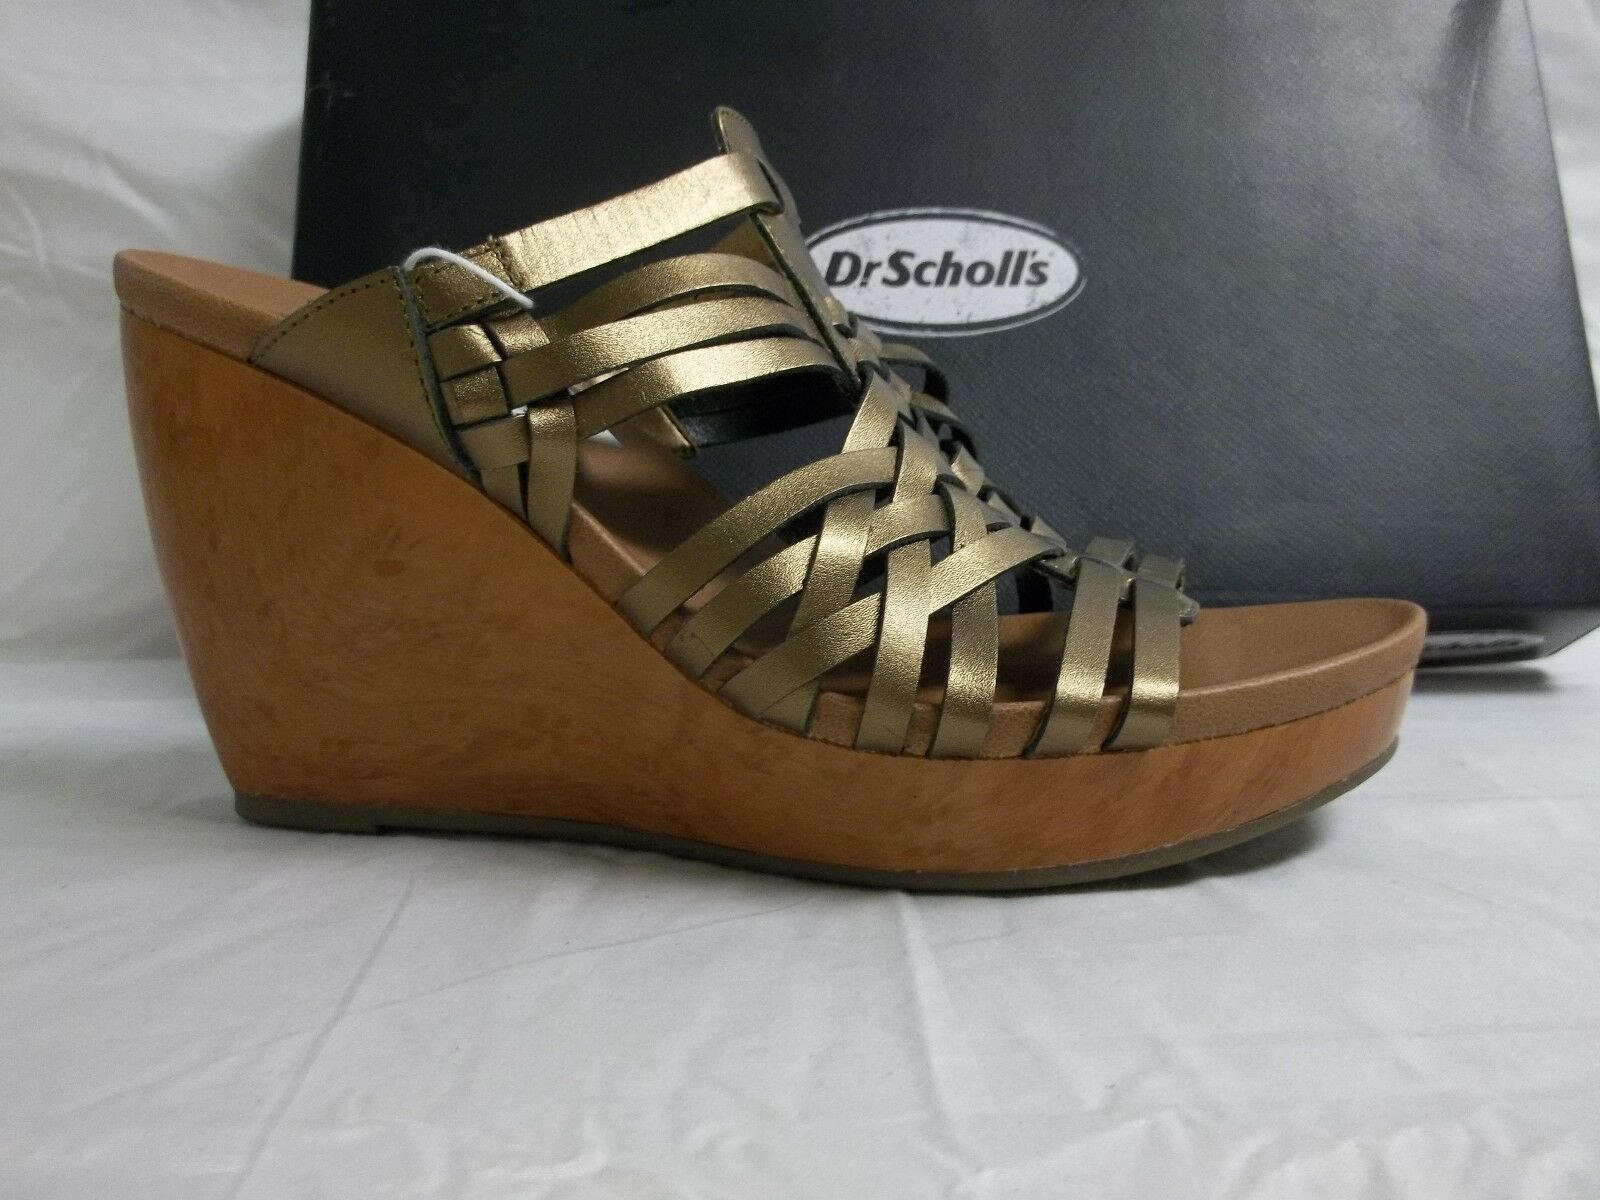 Dr. Scholl's Größe 8 M Magan Bronze Leder Wedges Sandales NEU Damenschuhe Schuhes